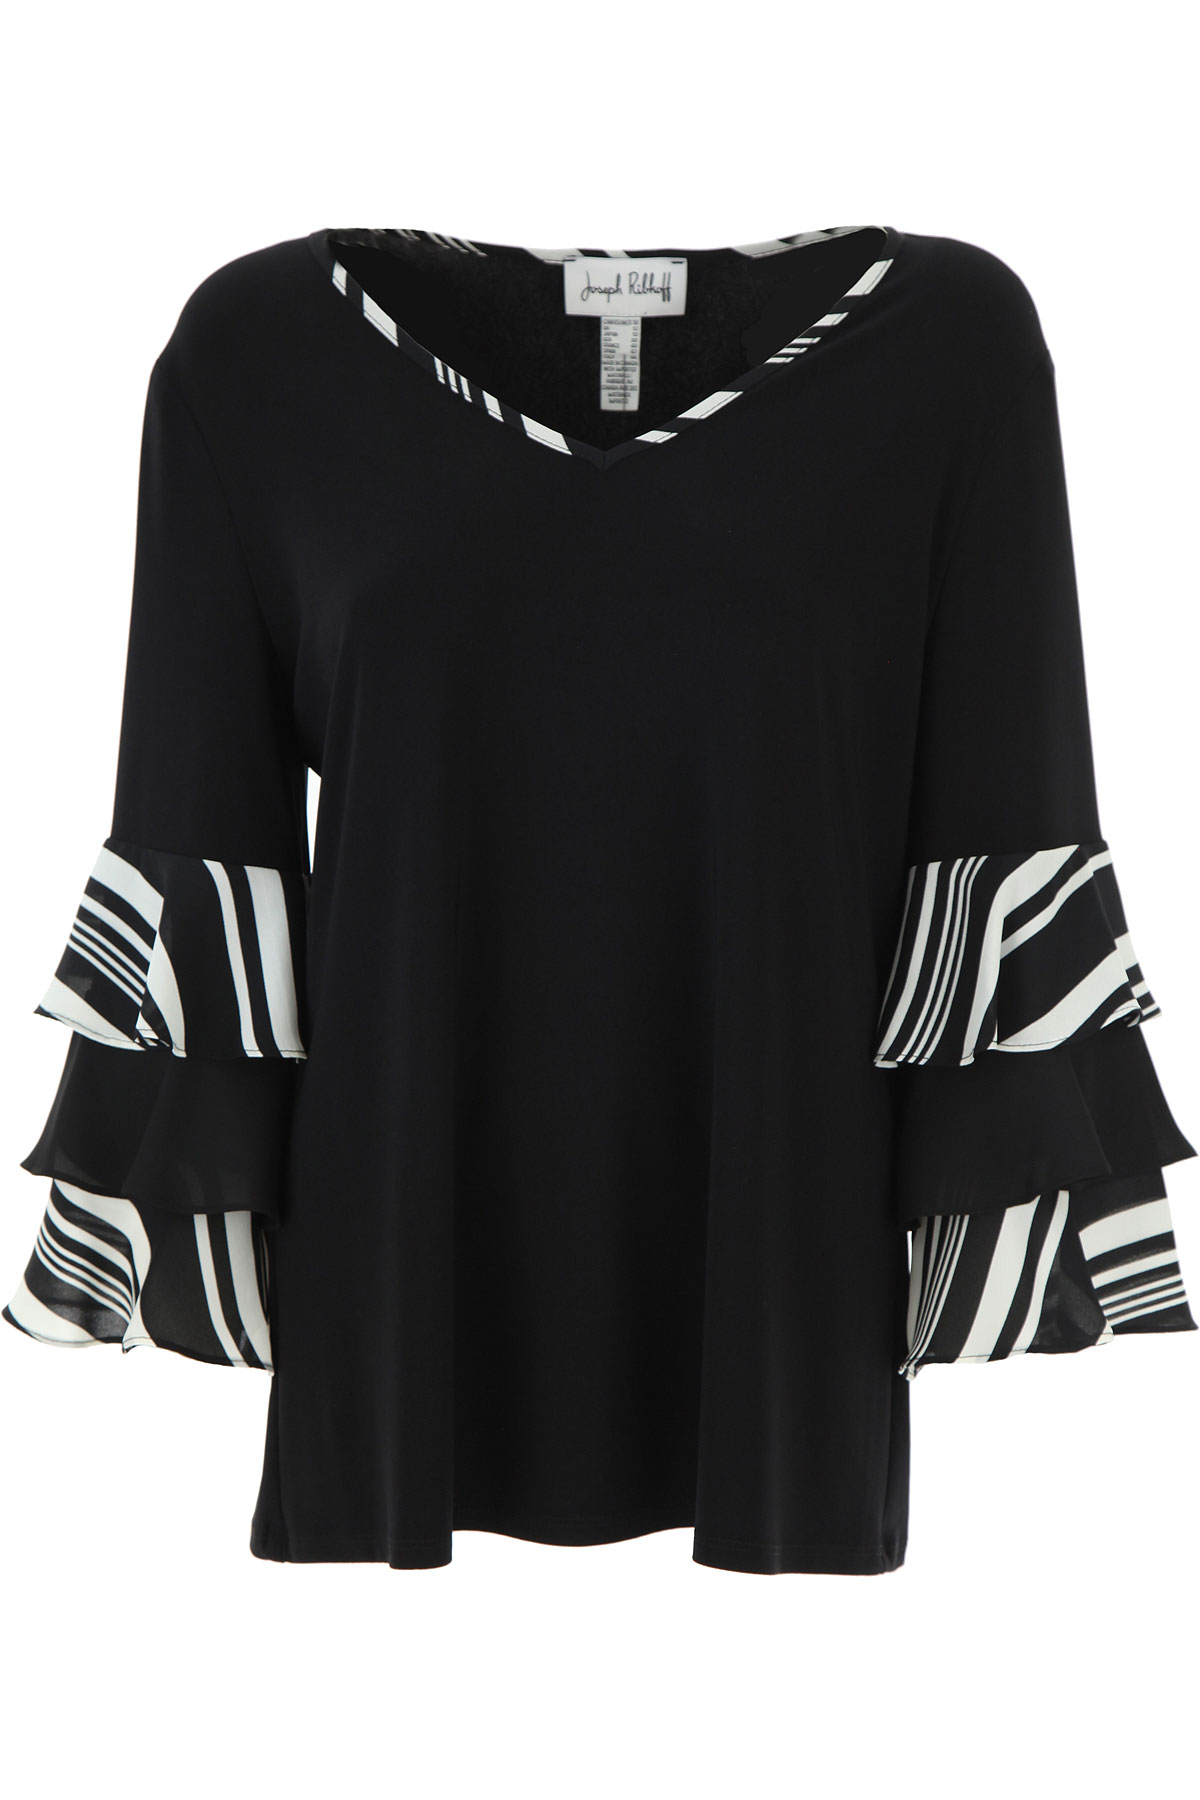 Joseph Ribkoff Top for Women On Sale, Black, polyester, 2019, 10 12 14 8